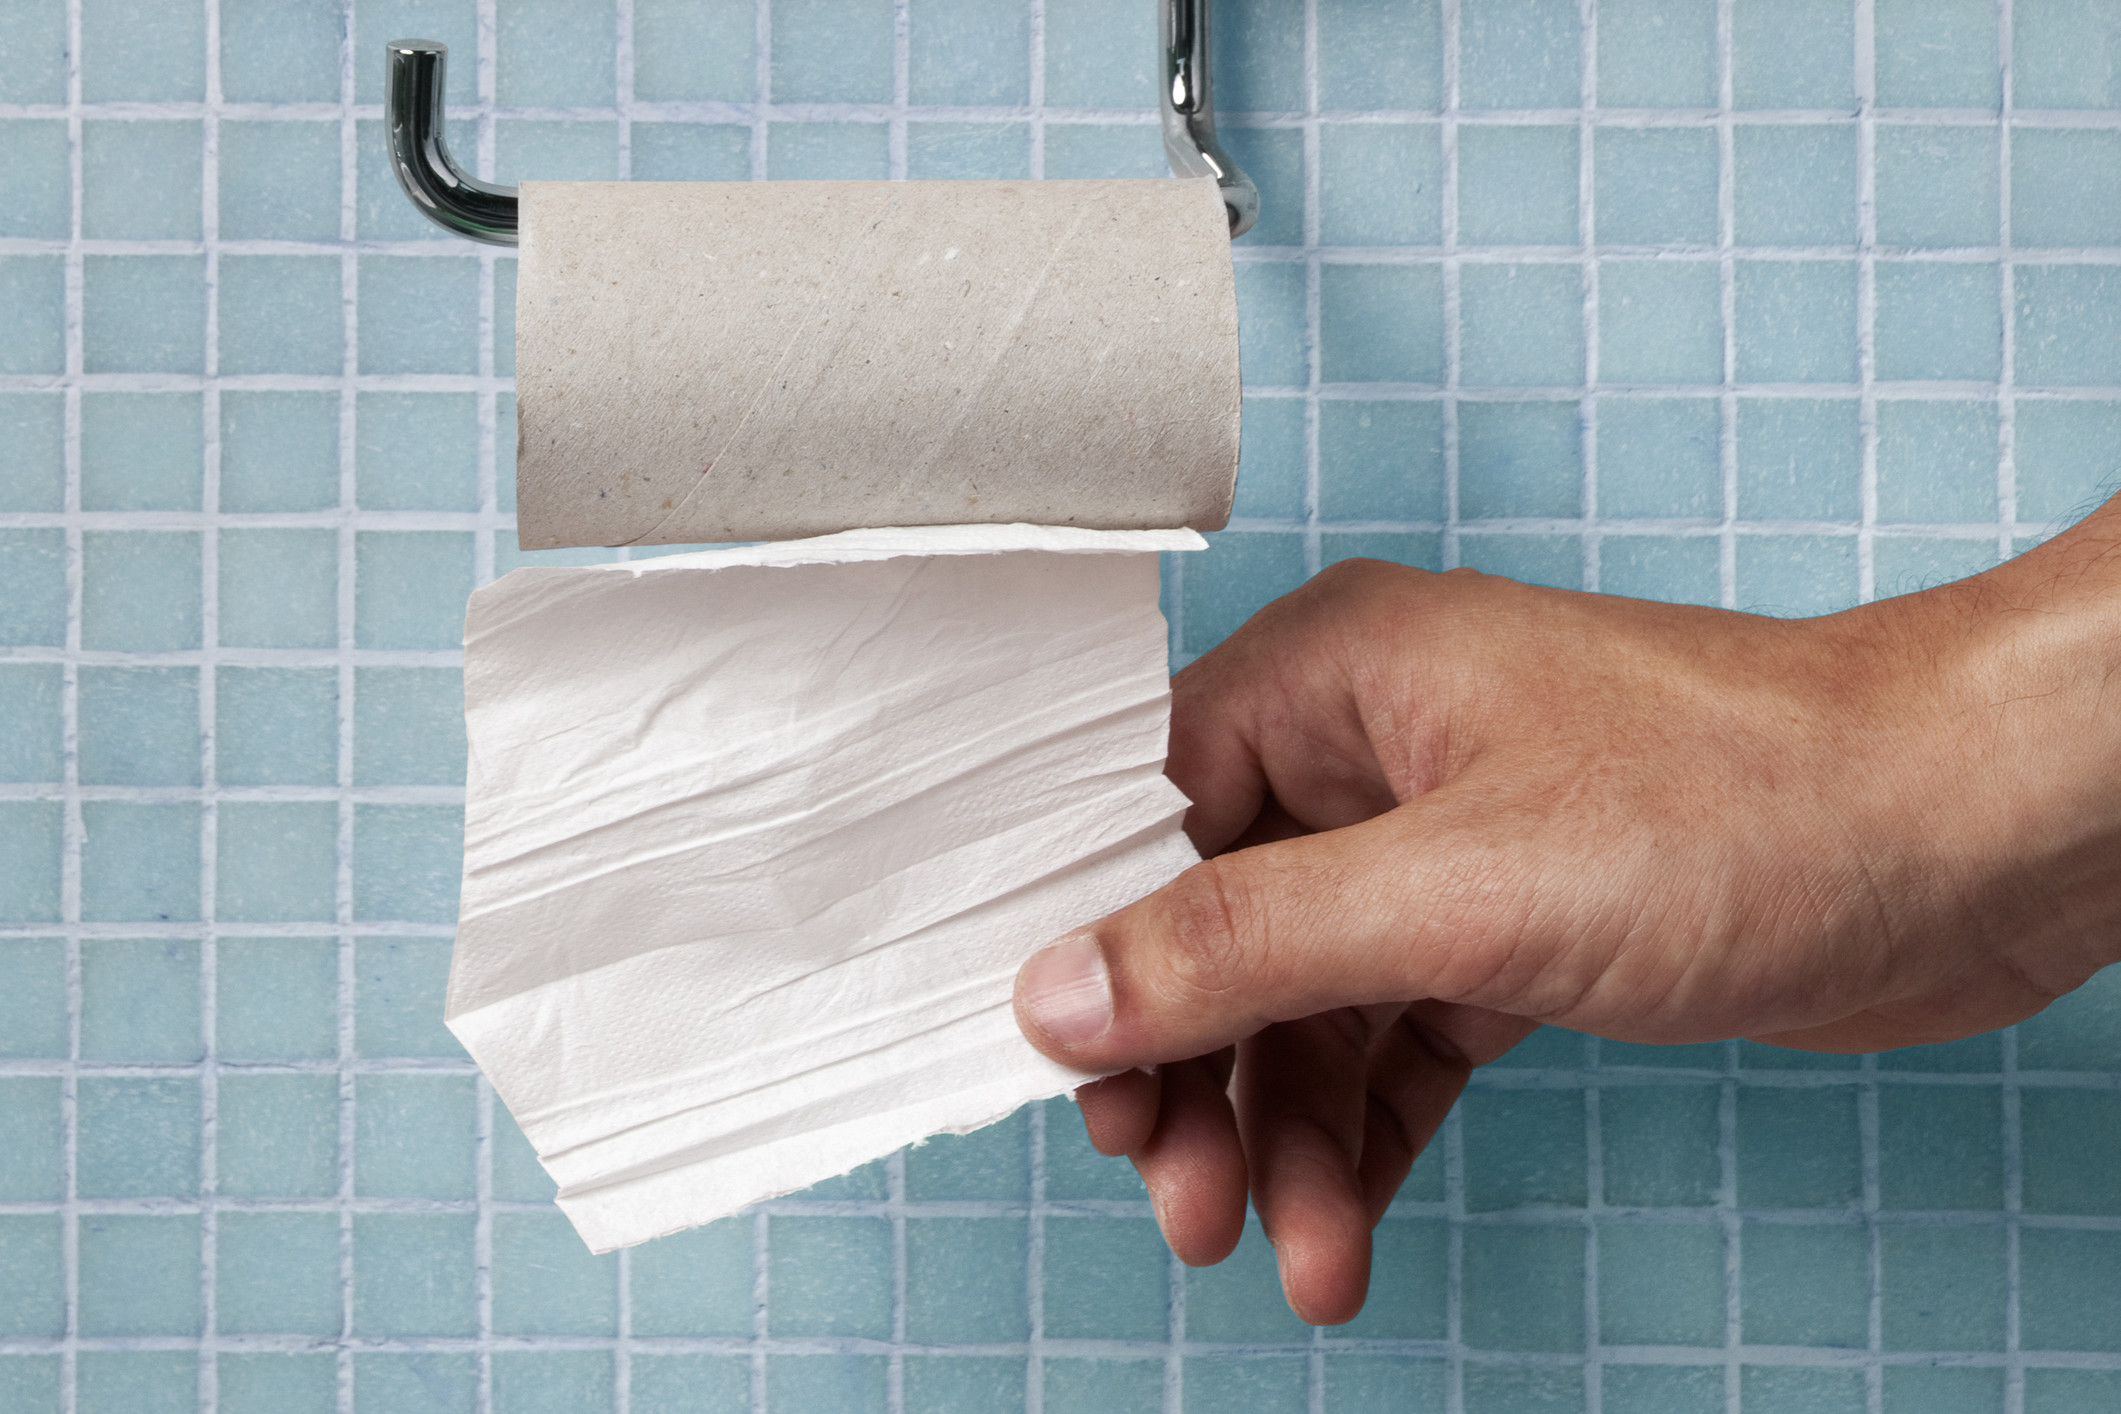 hand grabbing toilet paper